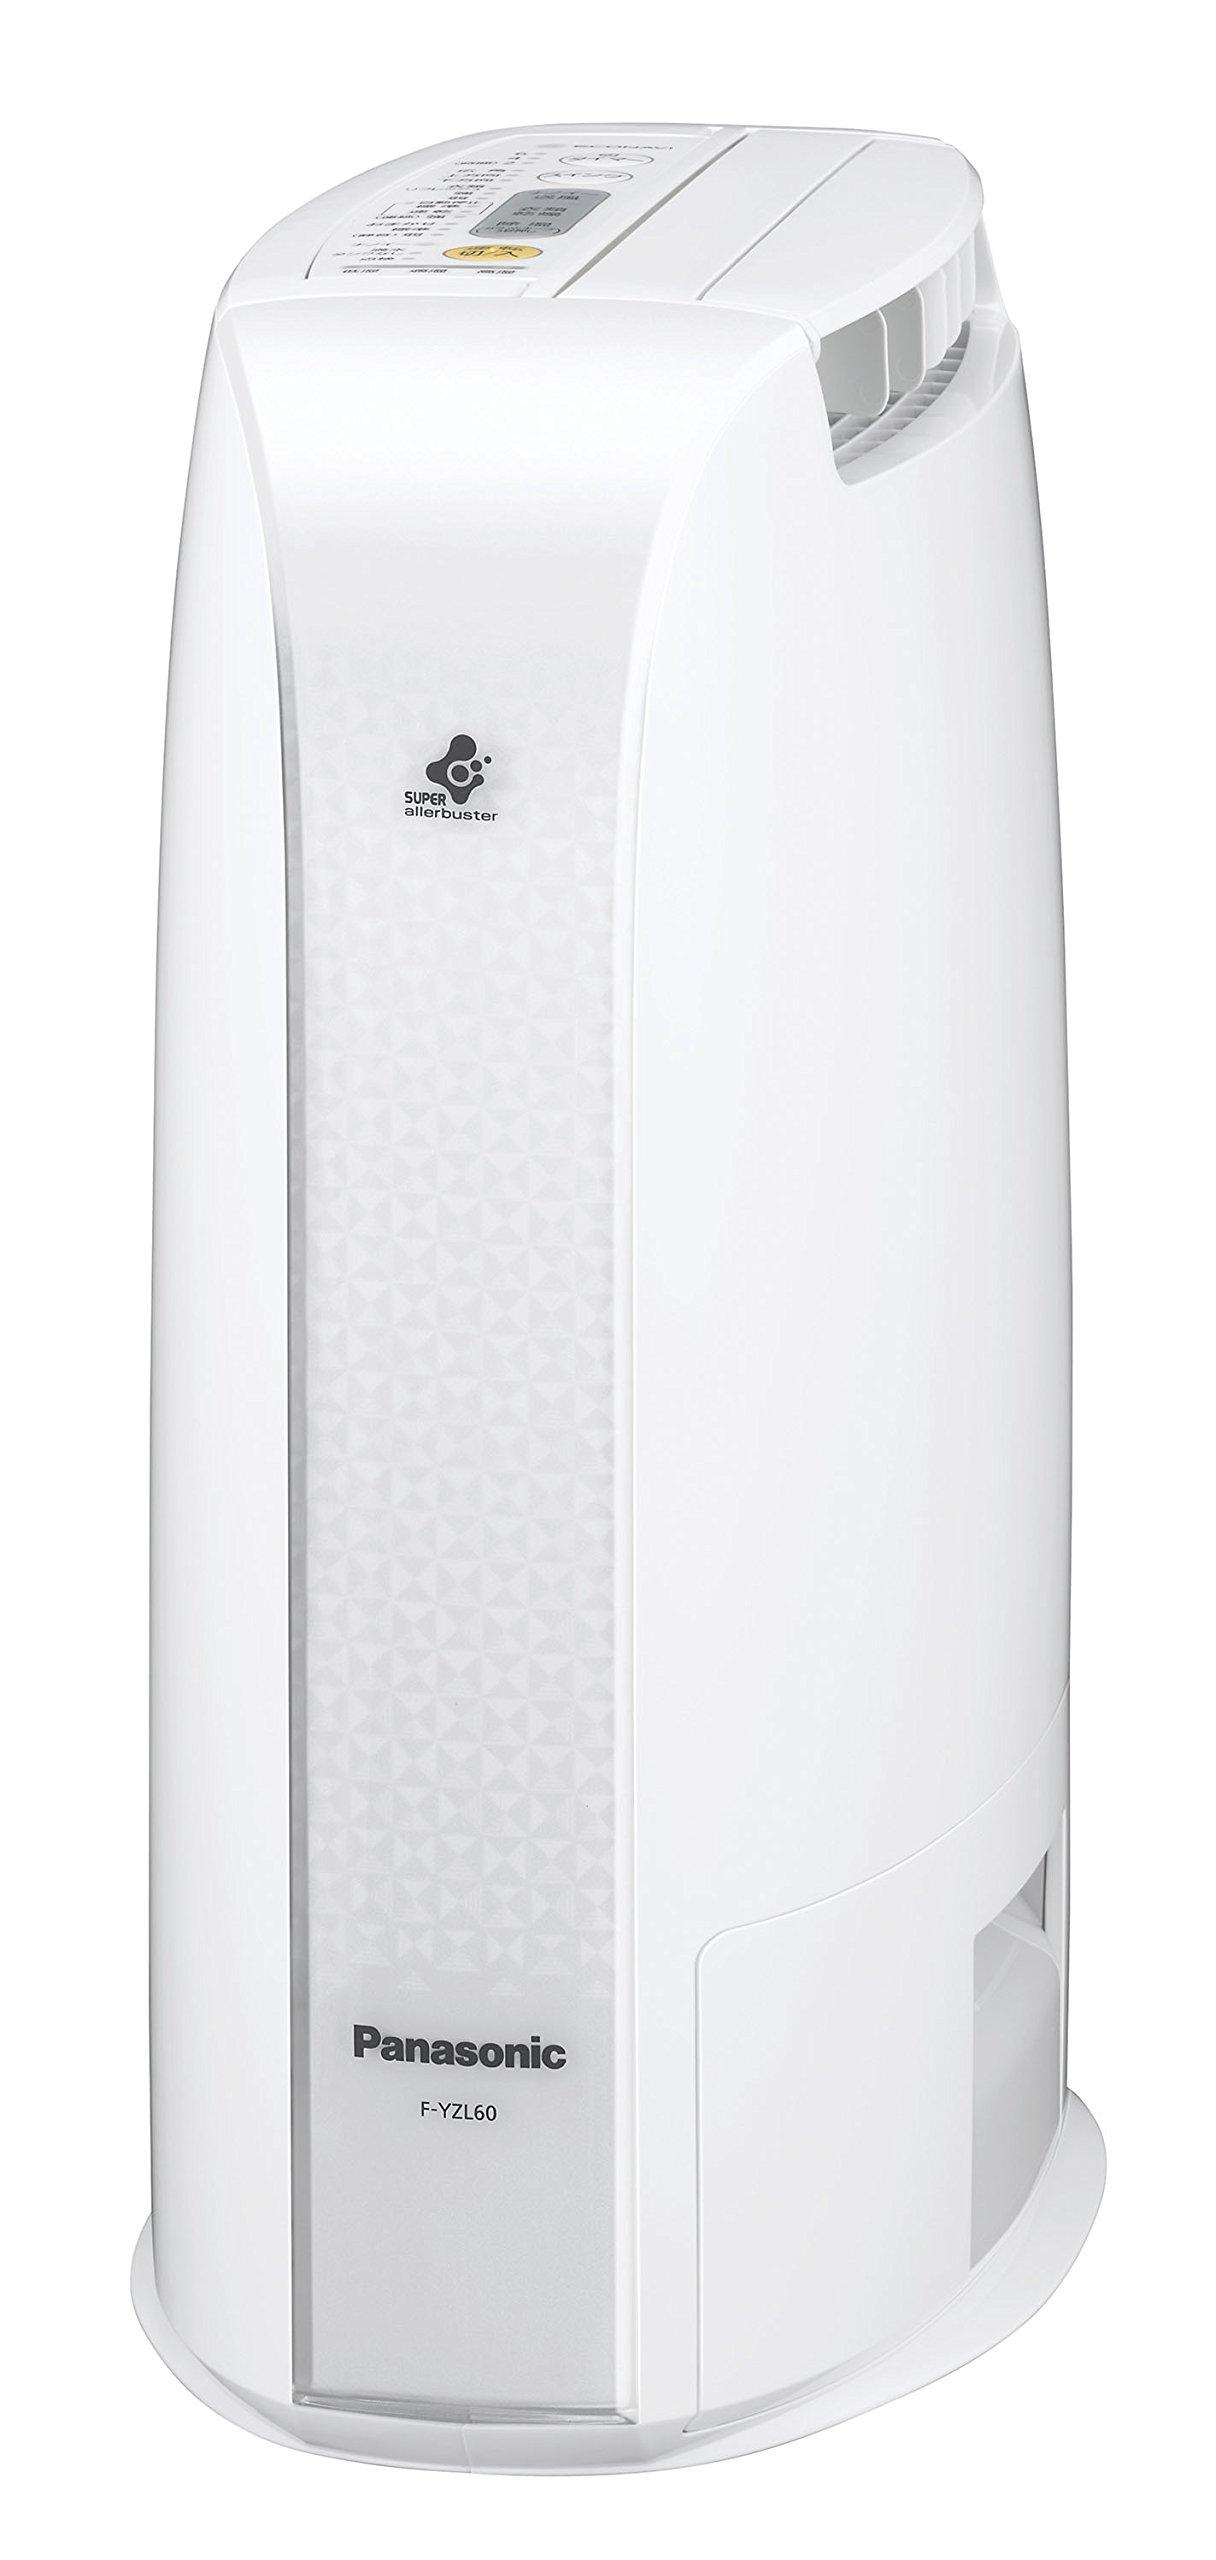 Panasonic Global Eco Navi desiccant system clothes dryer dehumidifier white F-YZL60-W